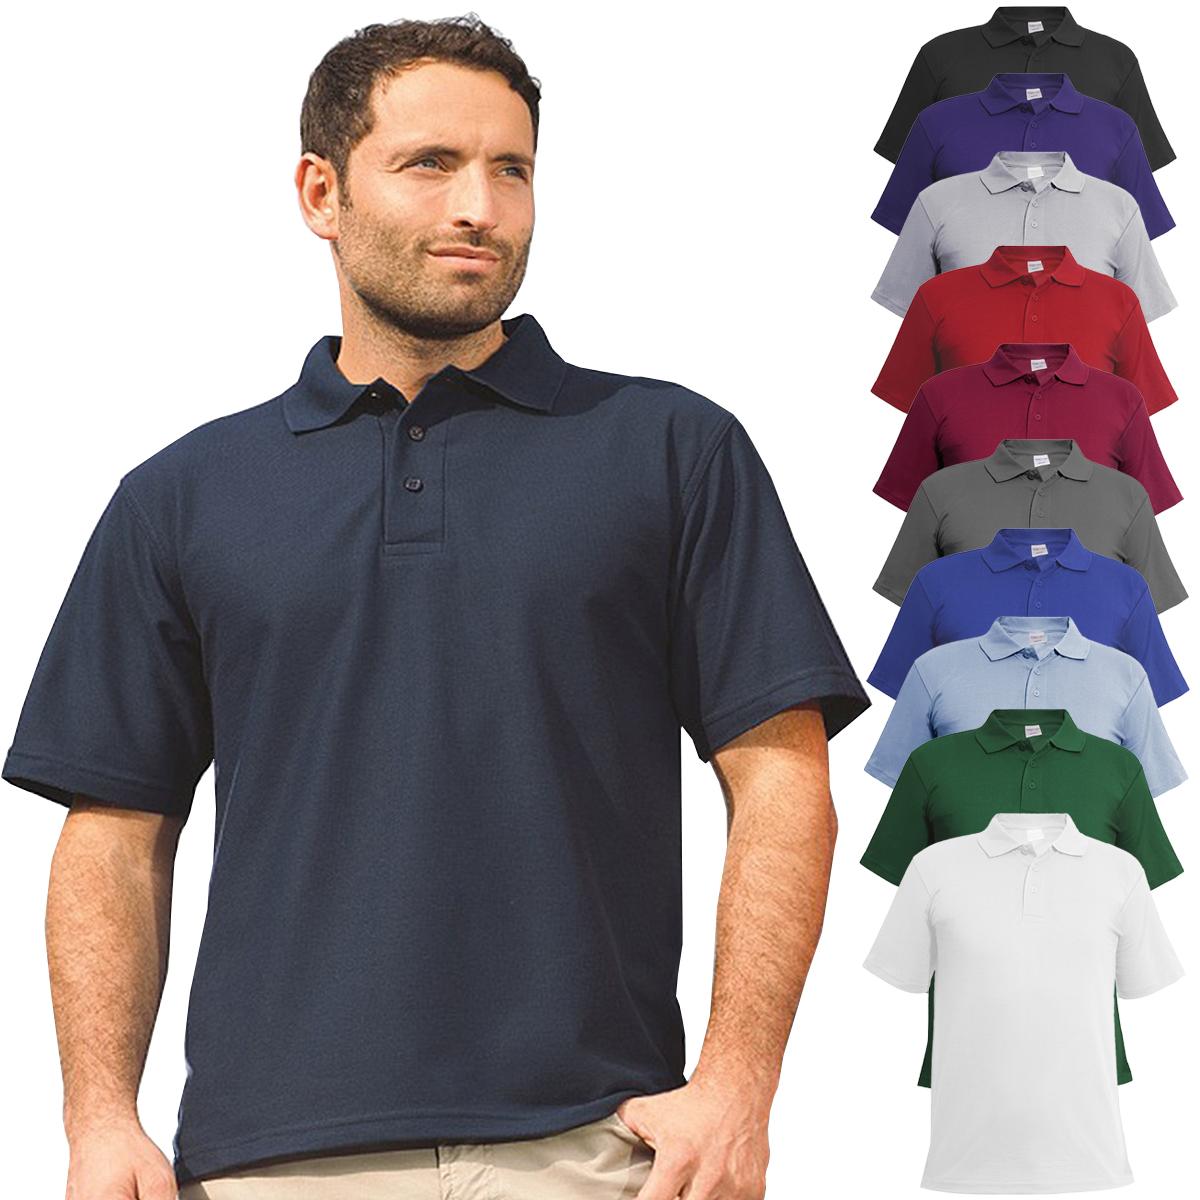 7799510b23d2 Mens Plus Size Classic Polo Top T-Shirt Plain Shirt Big And Tall Short  Sleeve